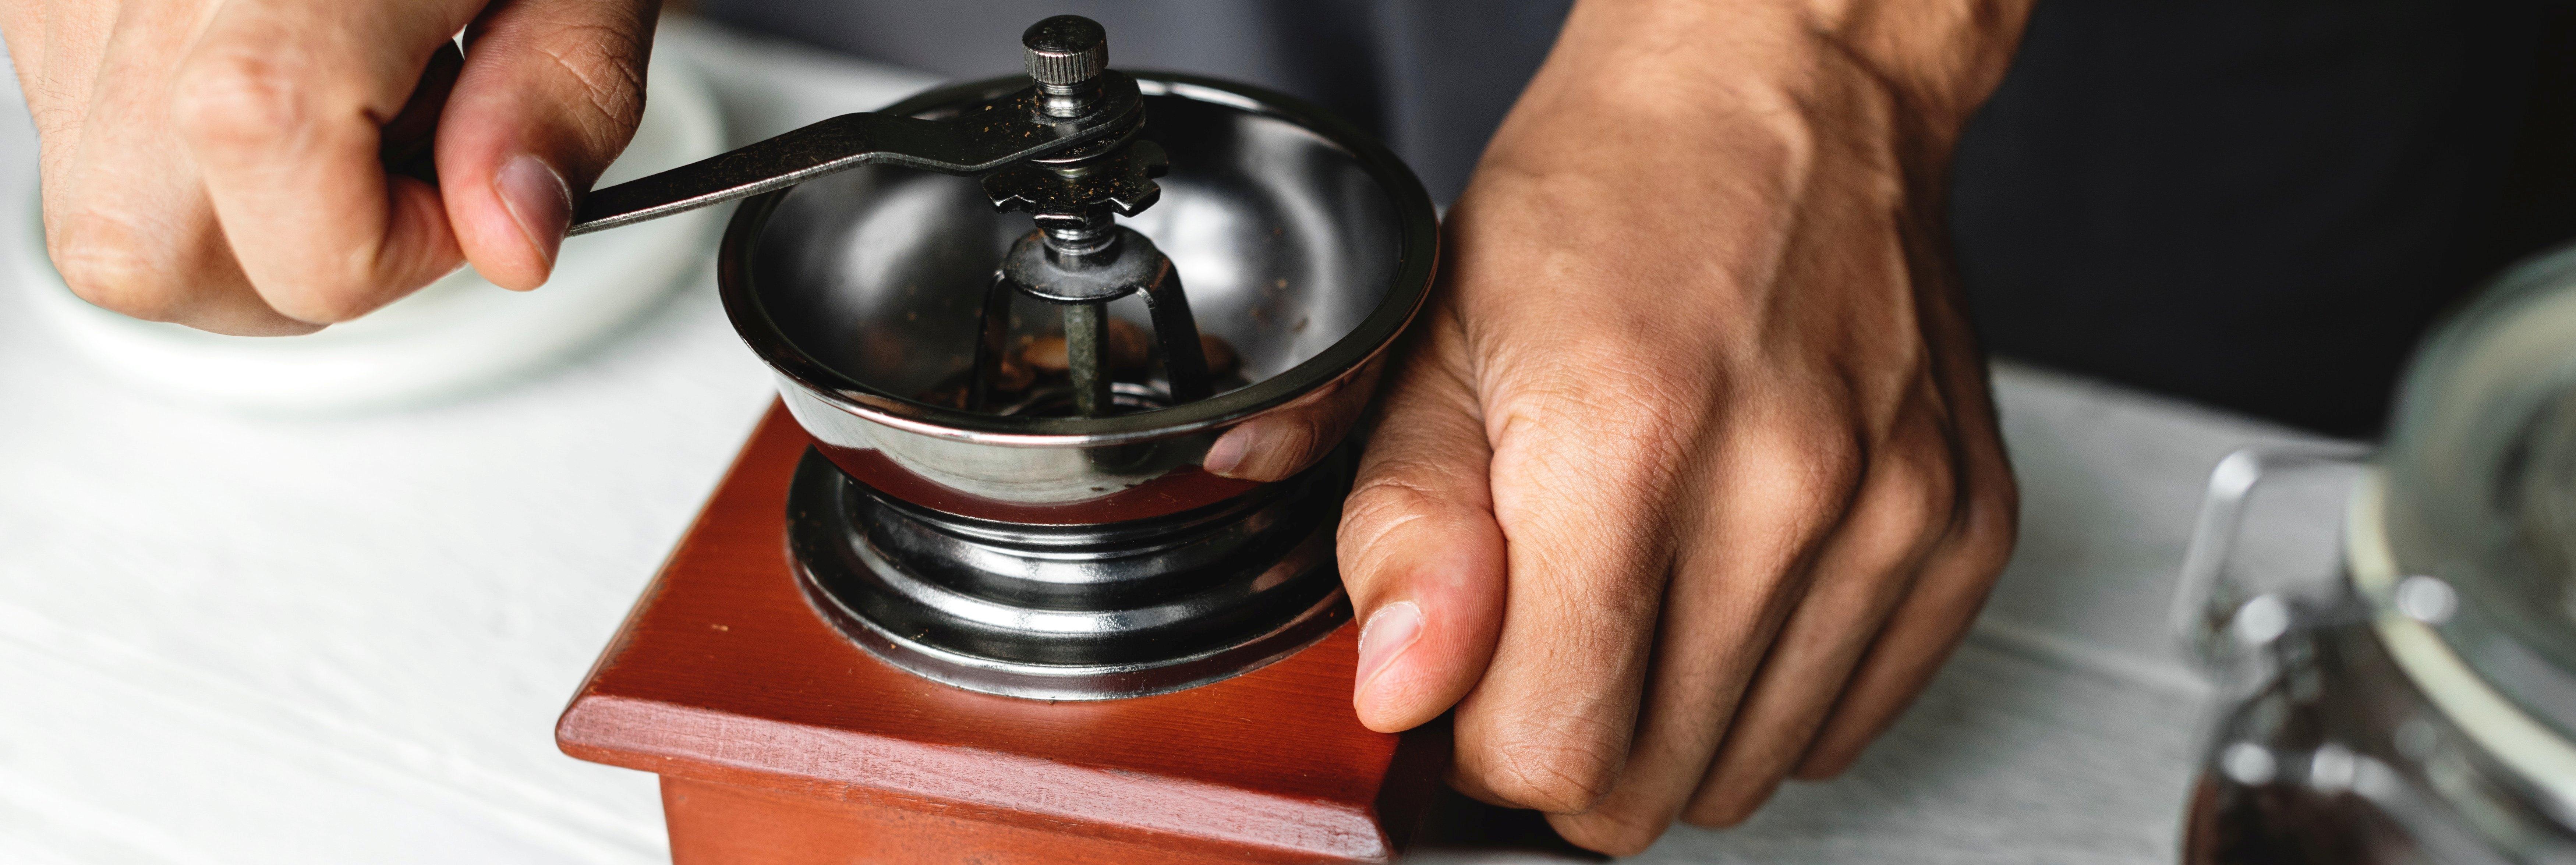 coffee grinder, кофе, молотый